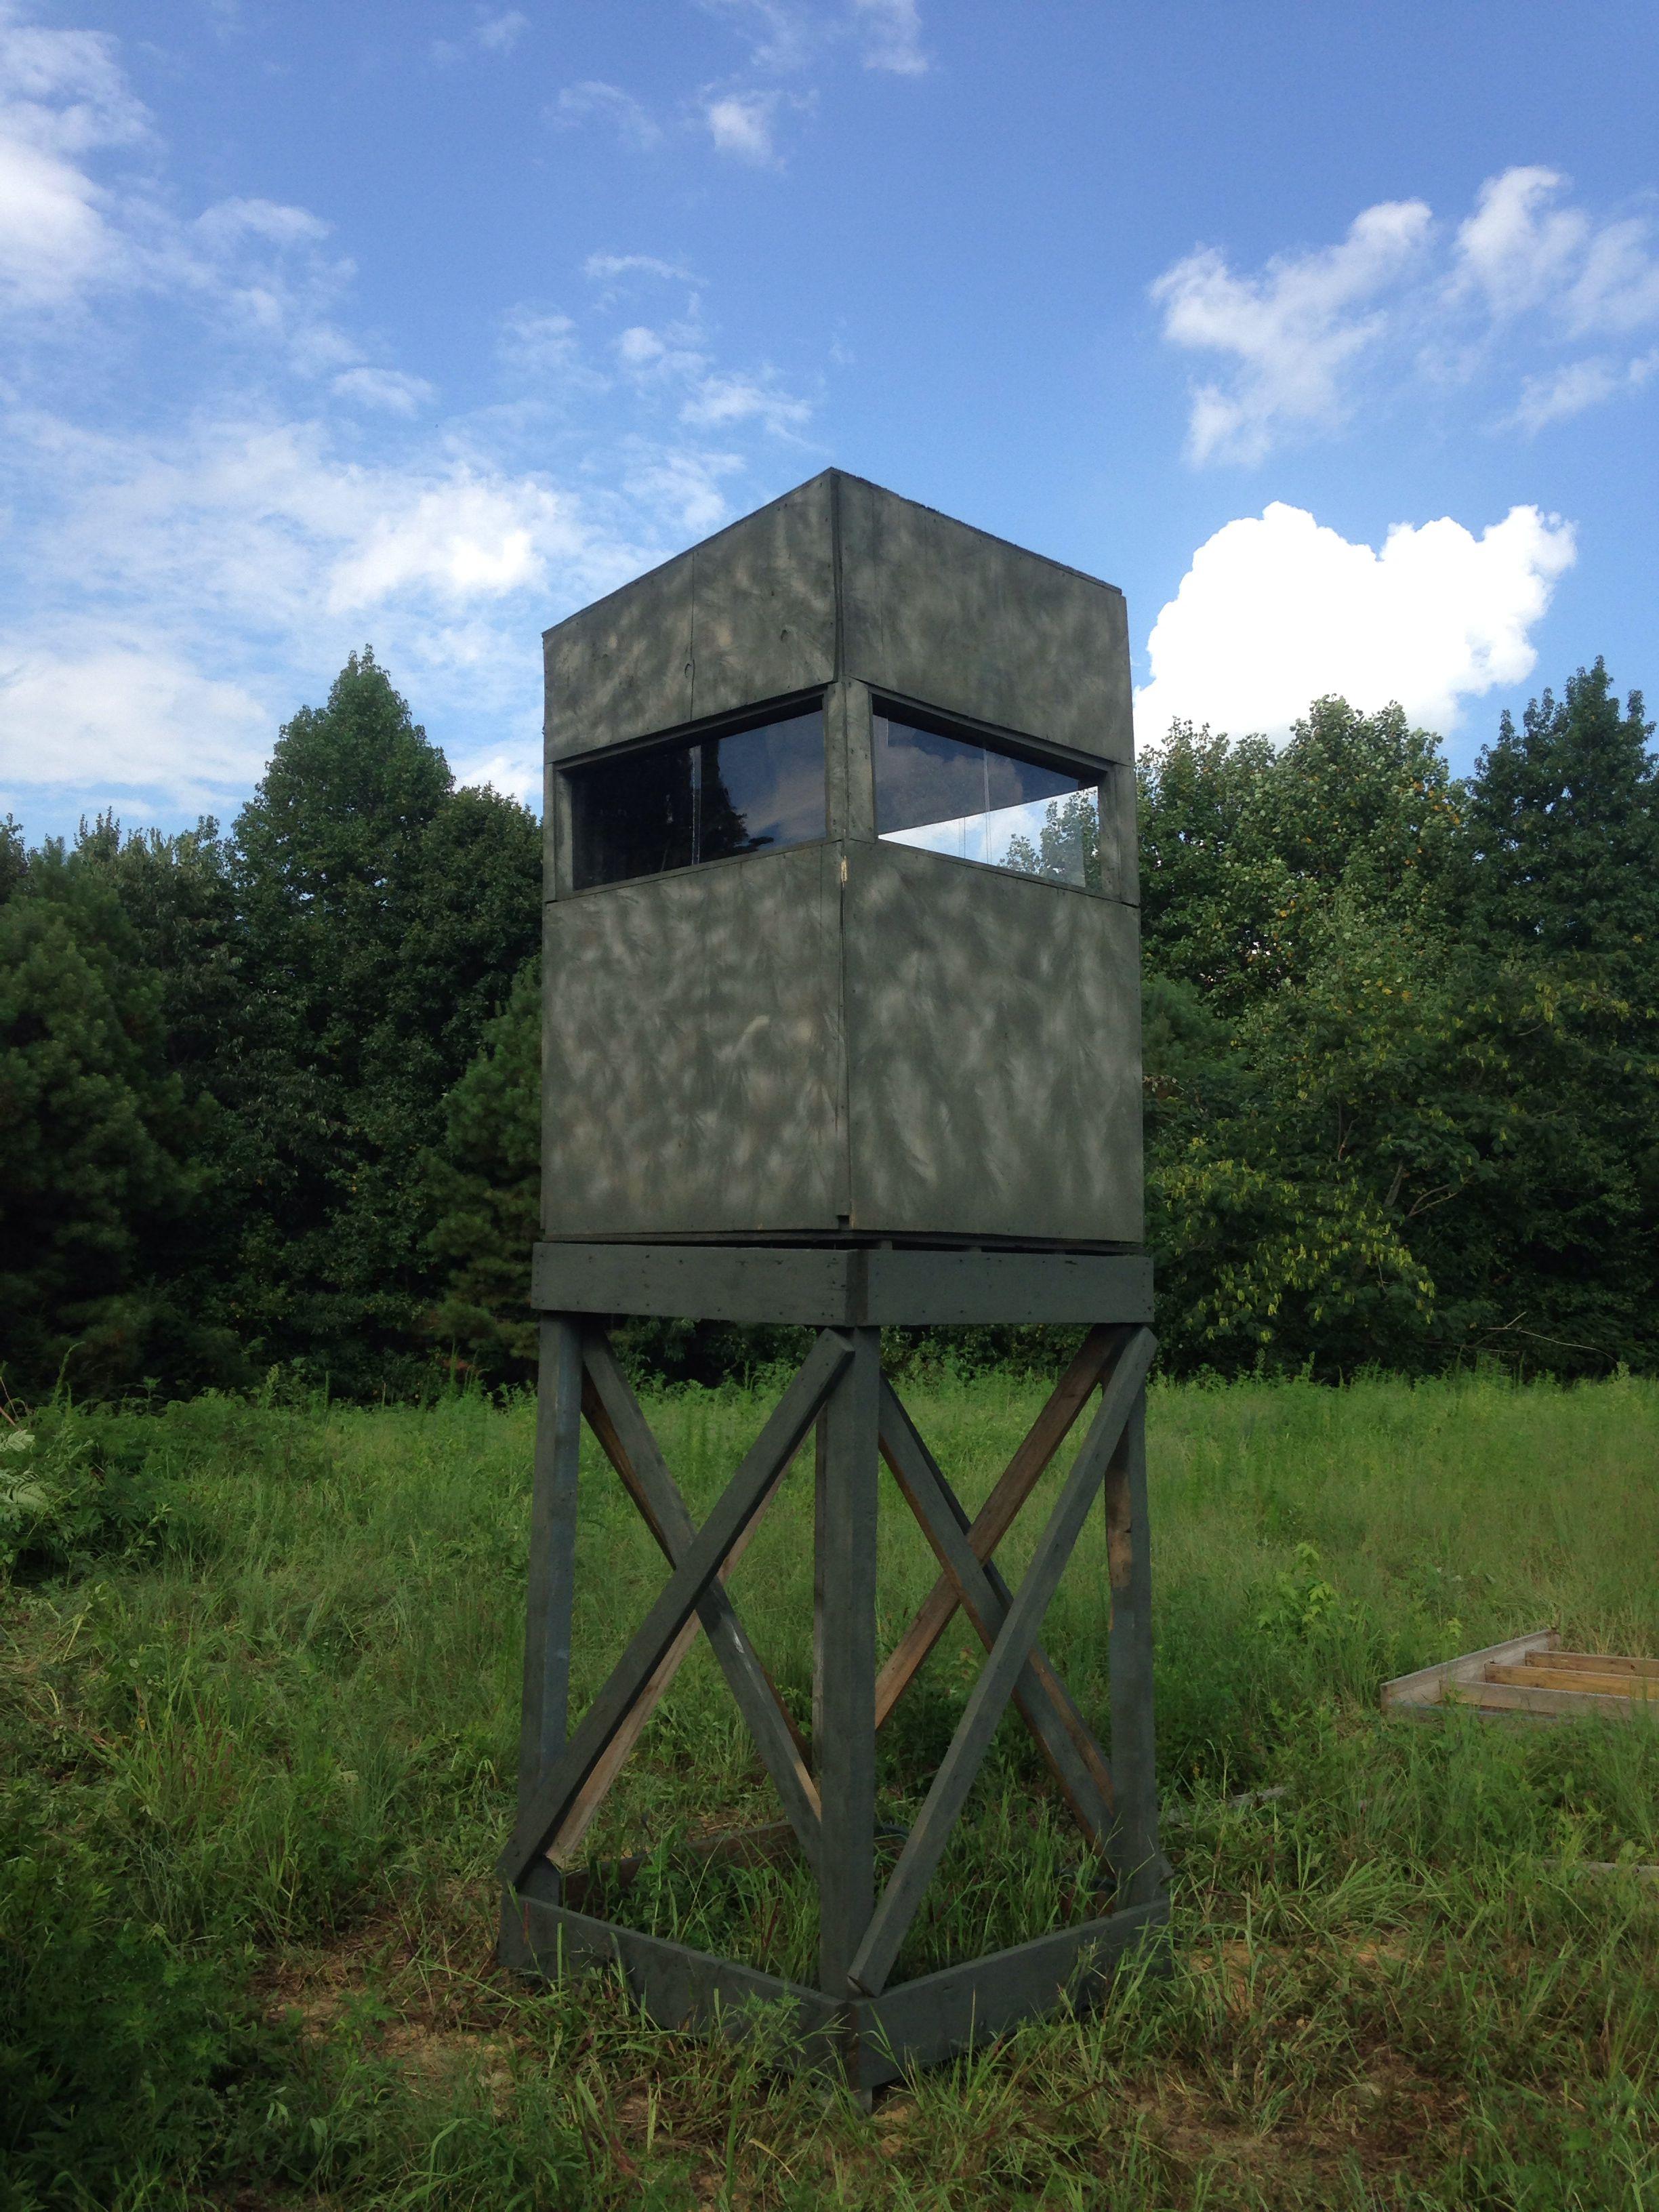 4x4 Shooting House With Sliding Plexiglass Windows